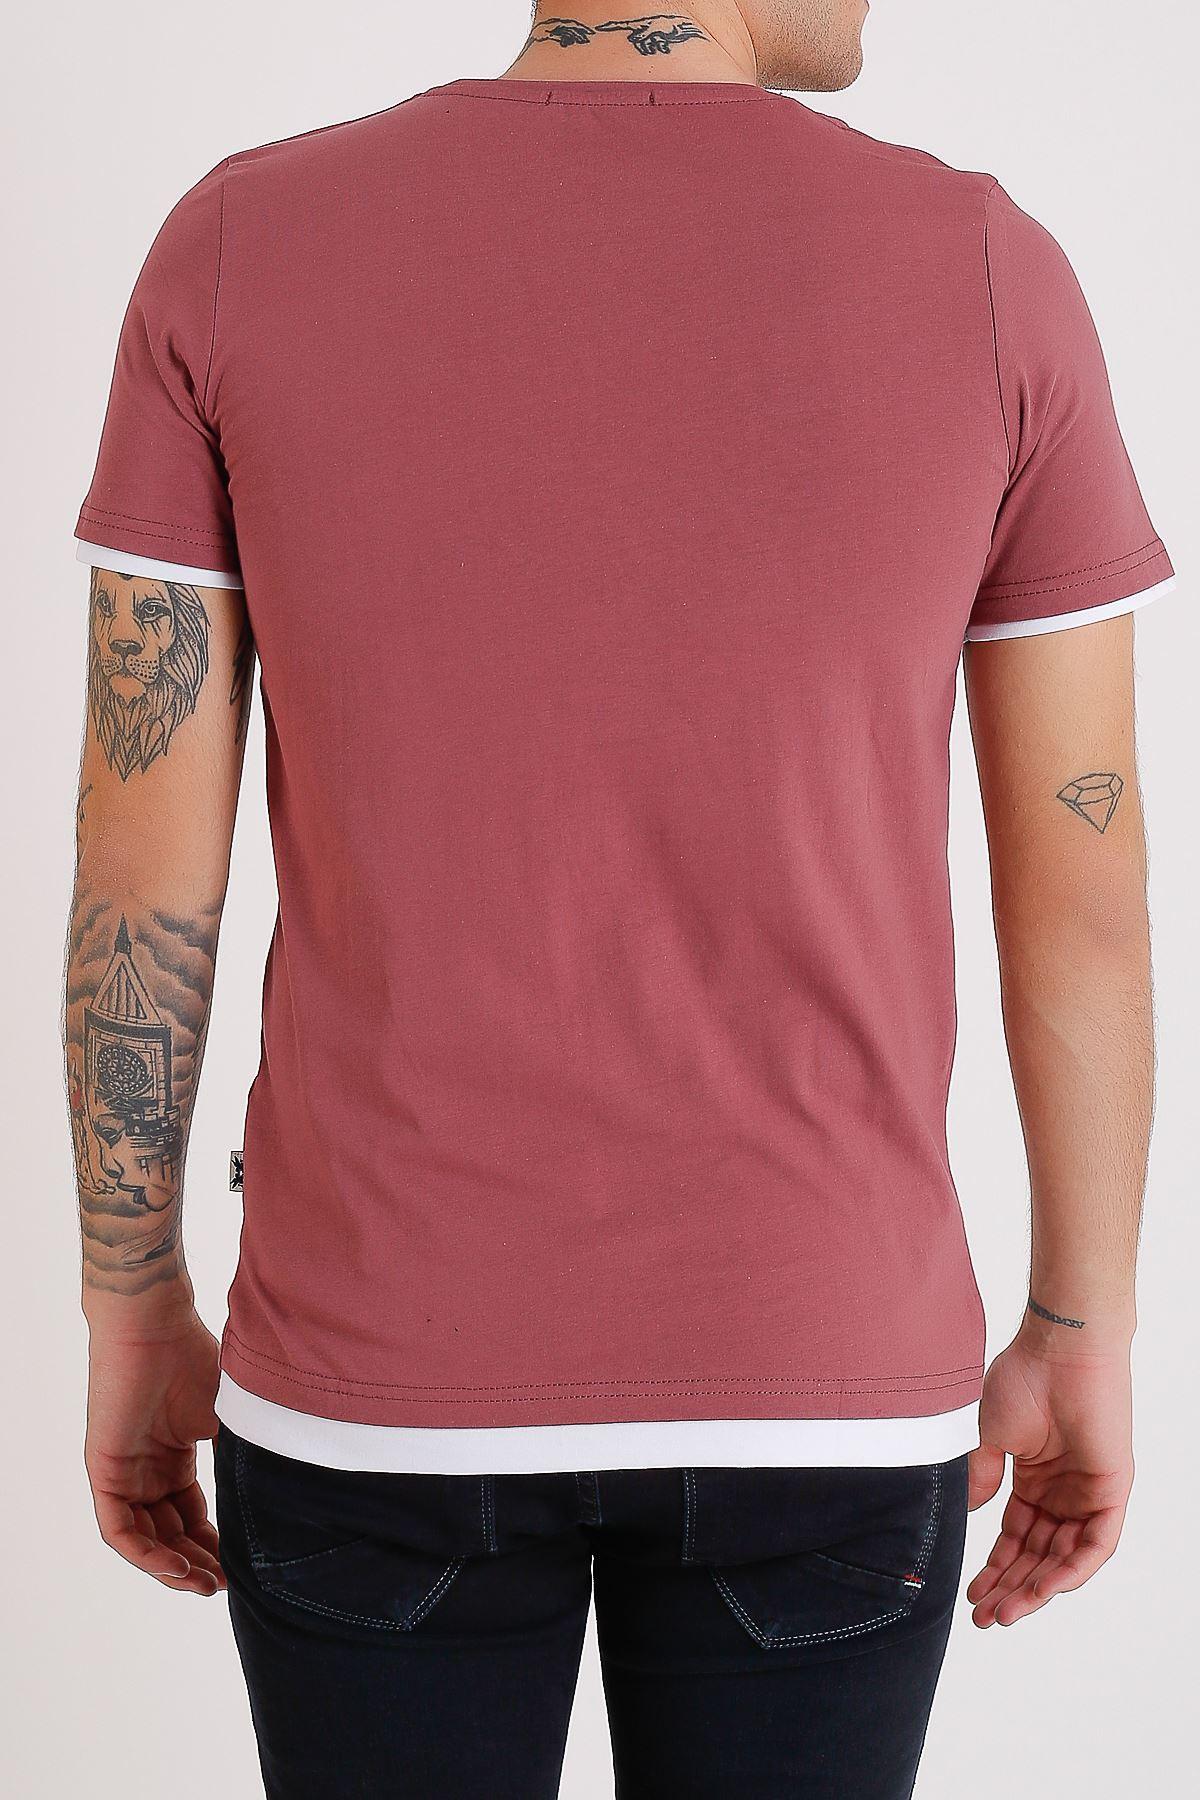 Bisiklet Yaka Nakışlı Vişne Ç. Erkek Penye T-Shirt